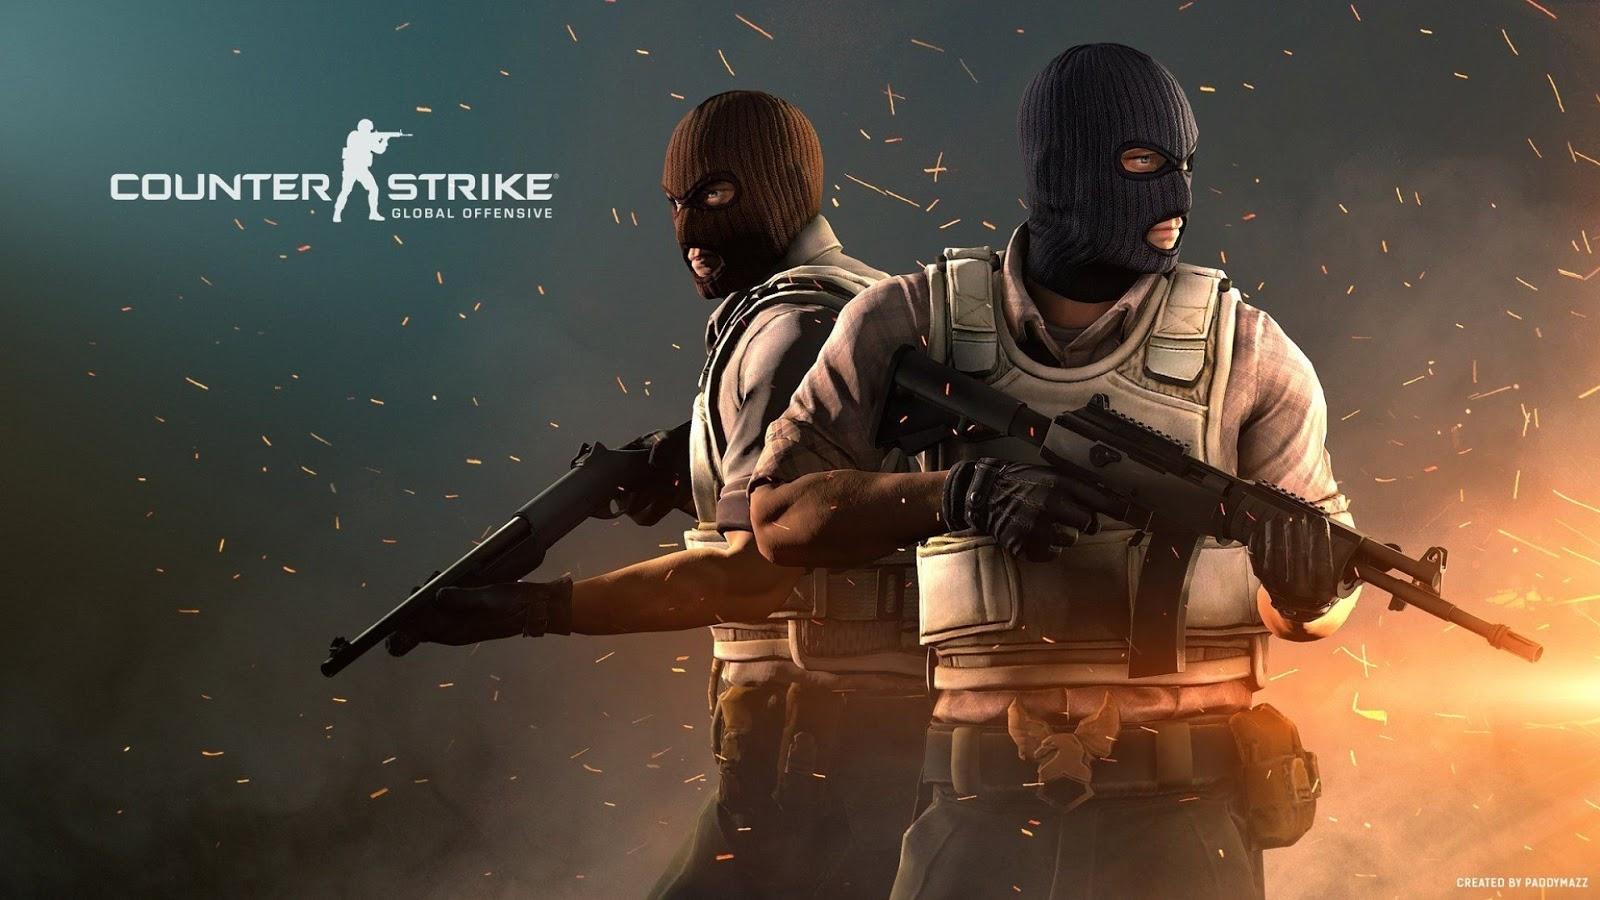 counter-strike-global-offensive-v13748-online-multiplayer